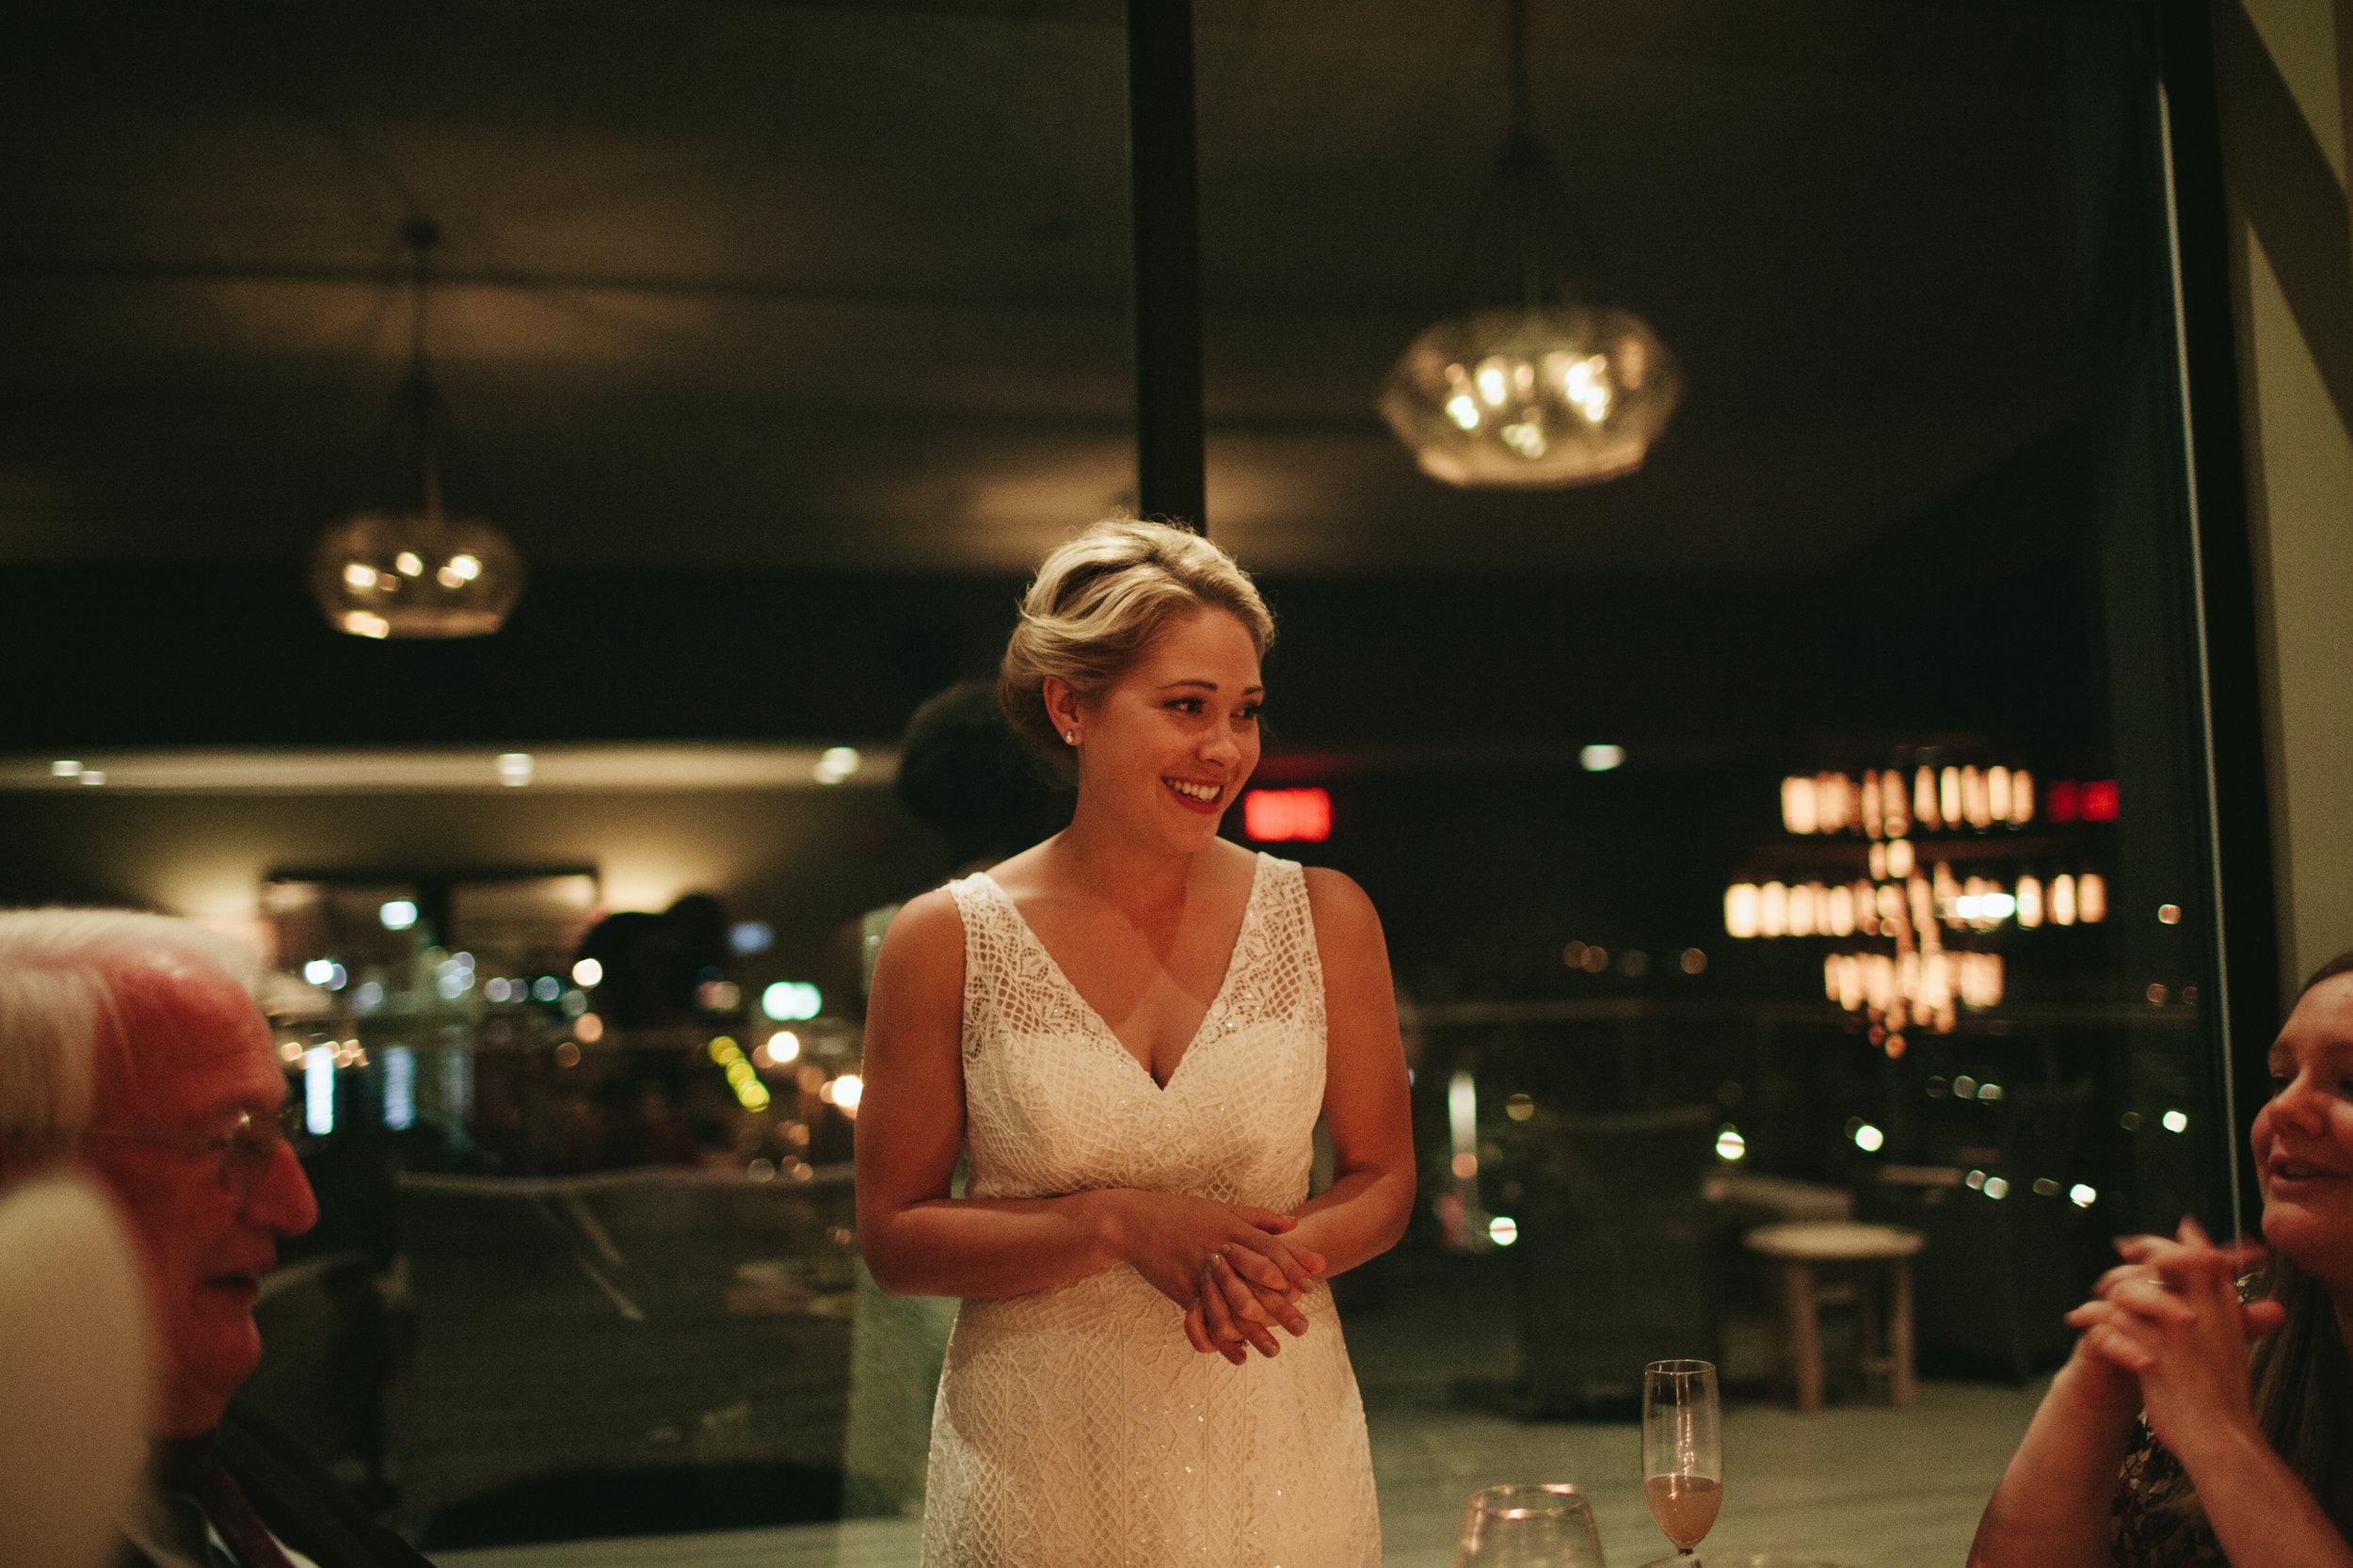 south-portland-maine-wedding-photographer-north-43-24.jpg